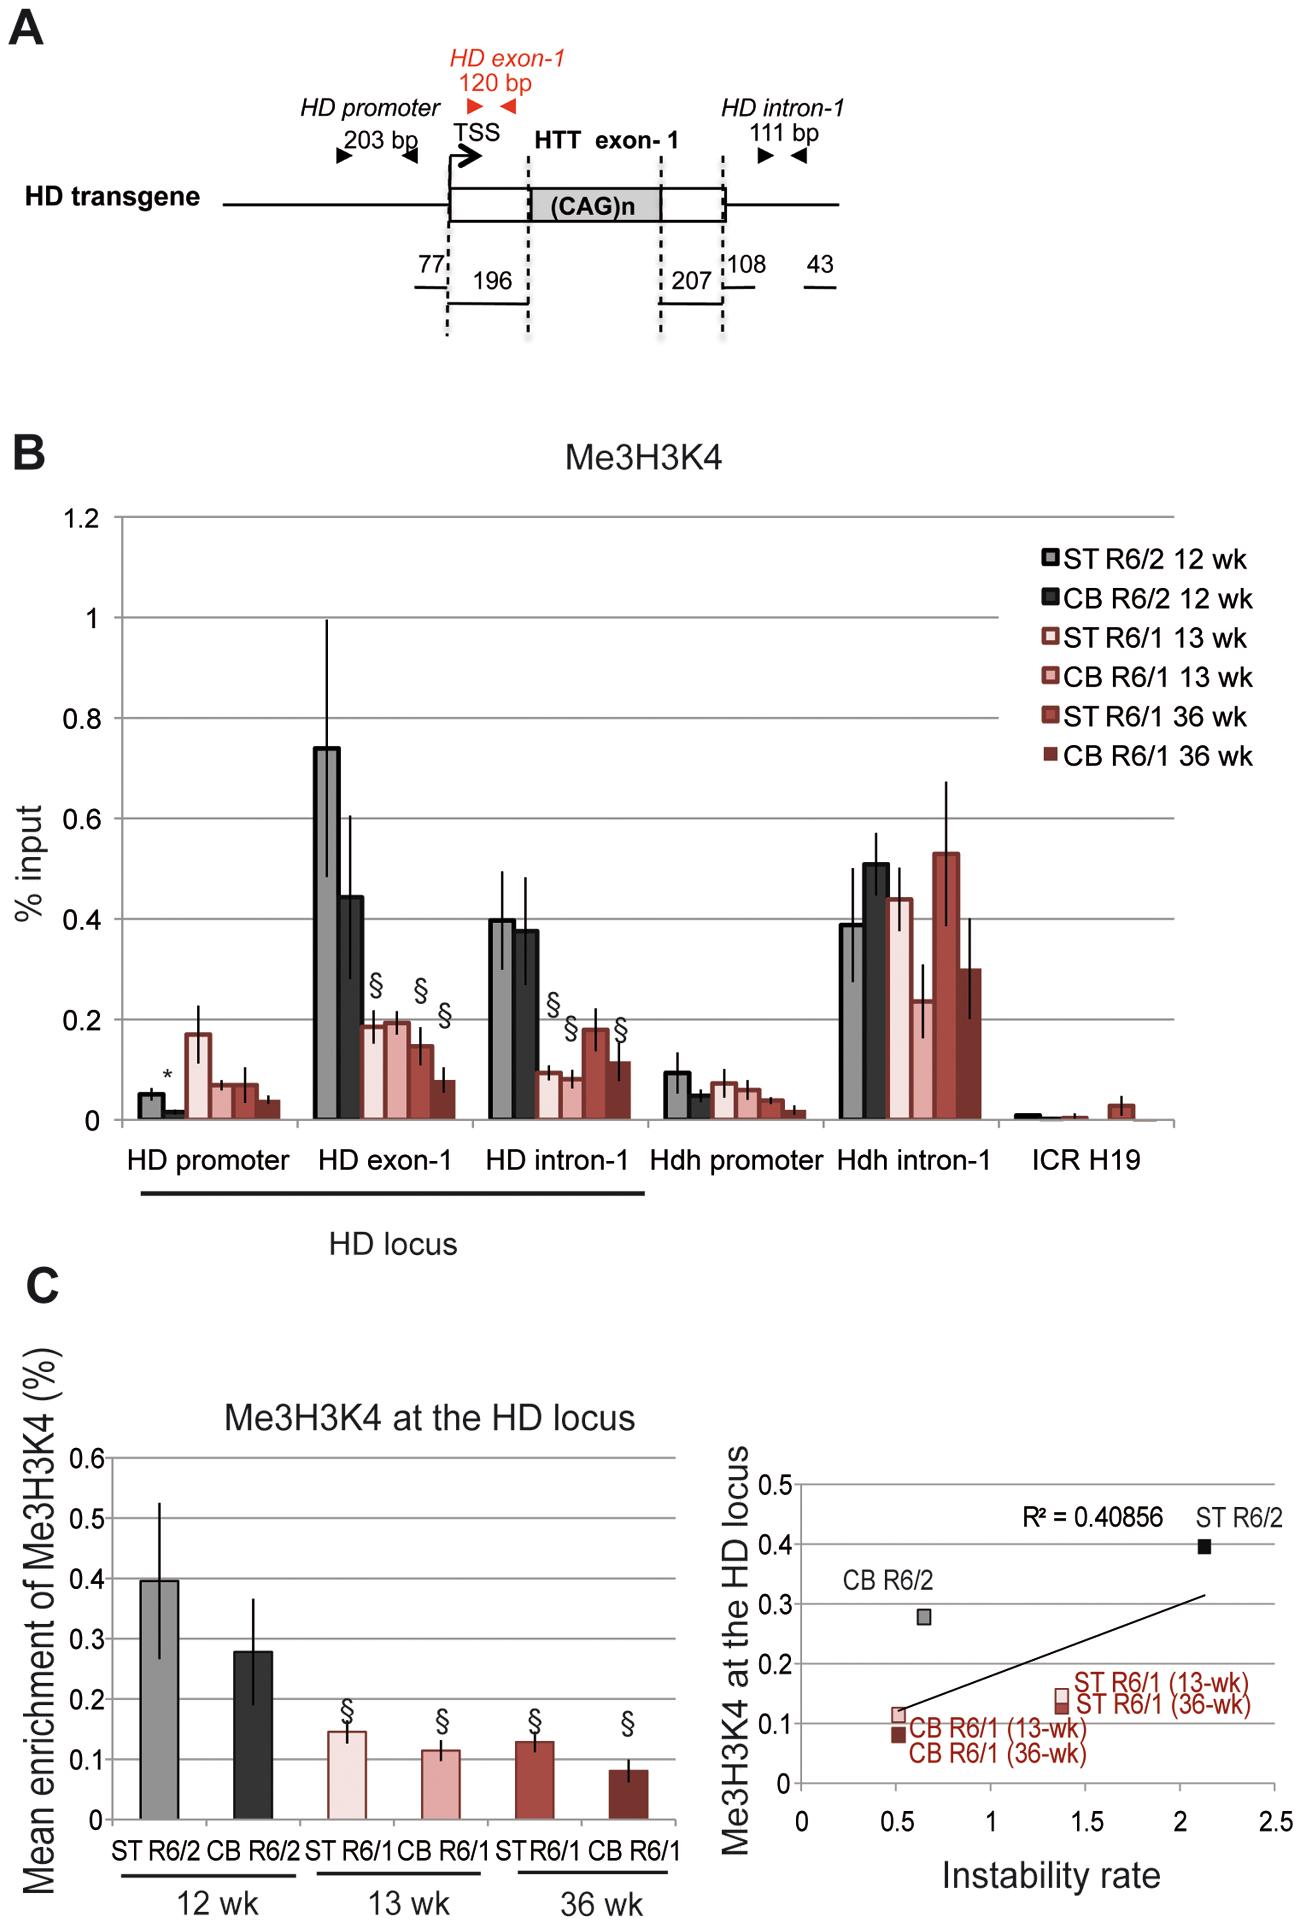 Me3H3K4 at the HD locus in R6/1 and R6/2 striatum and cerebellum.